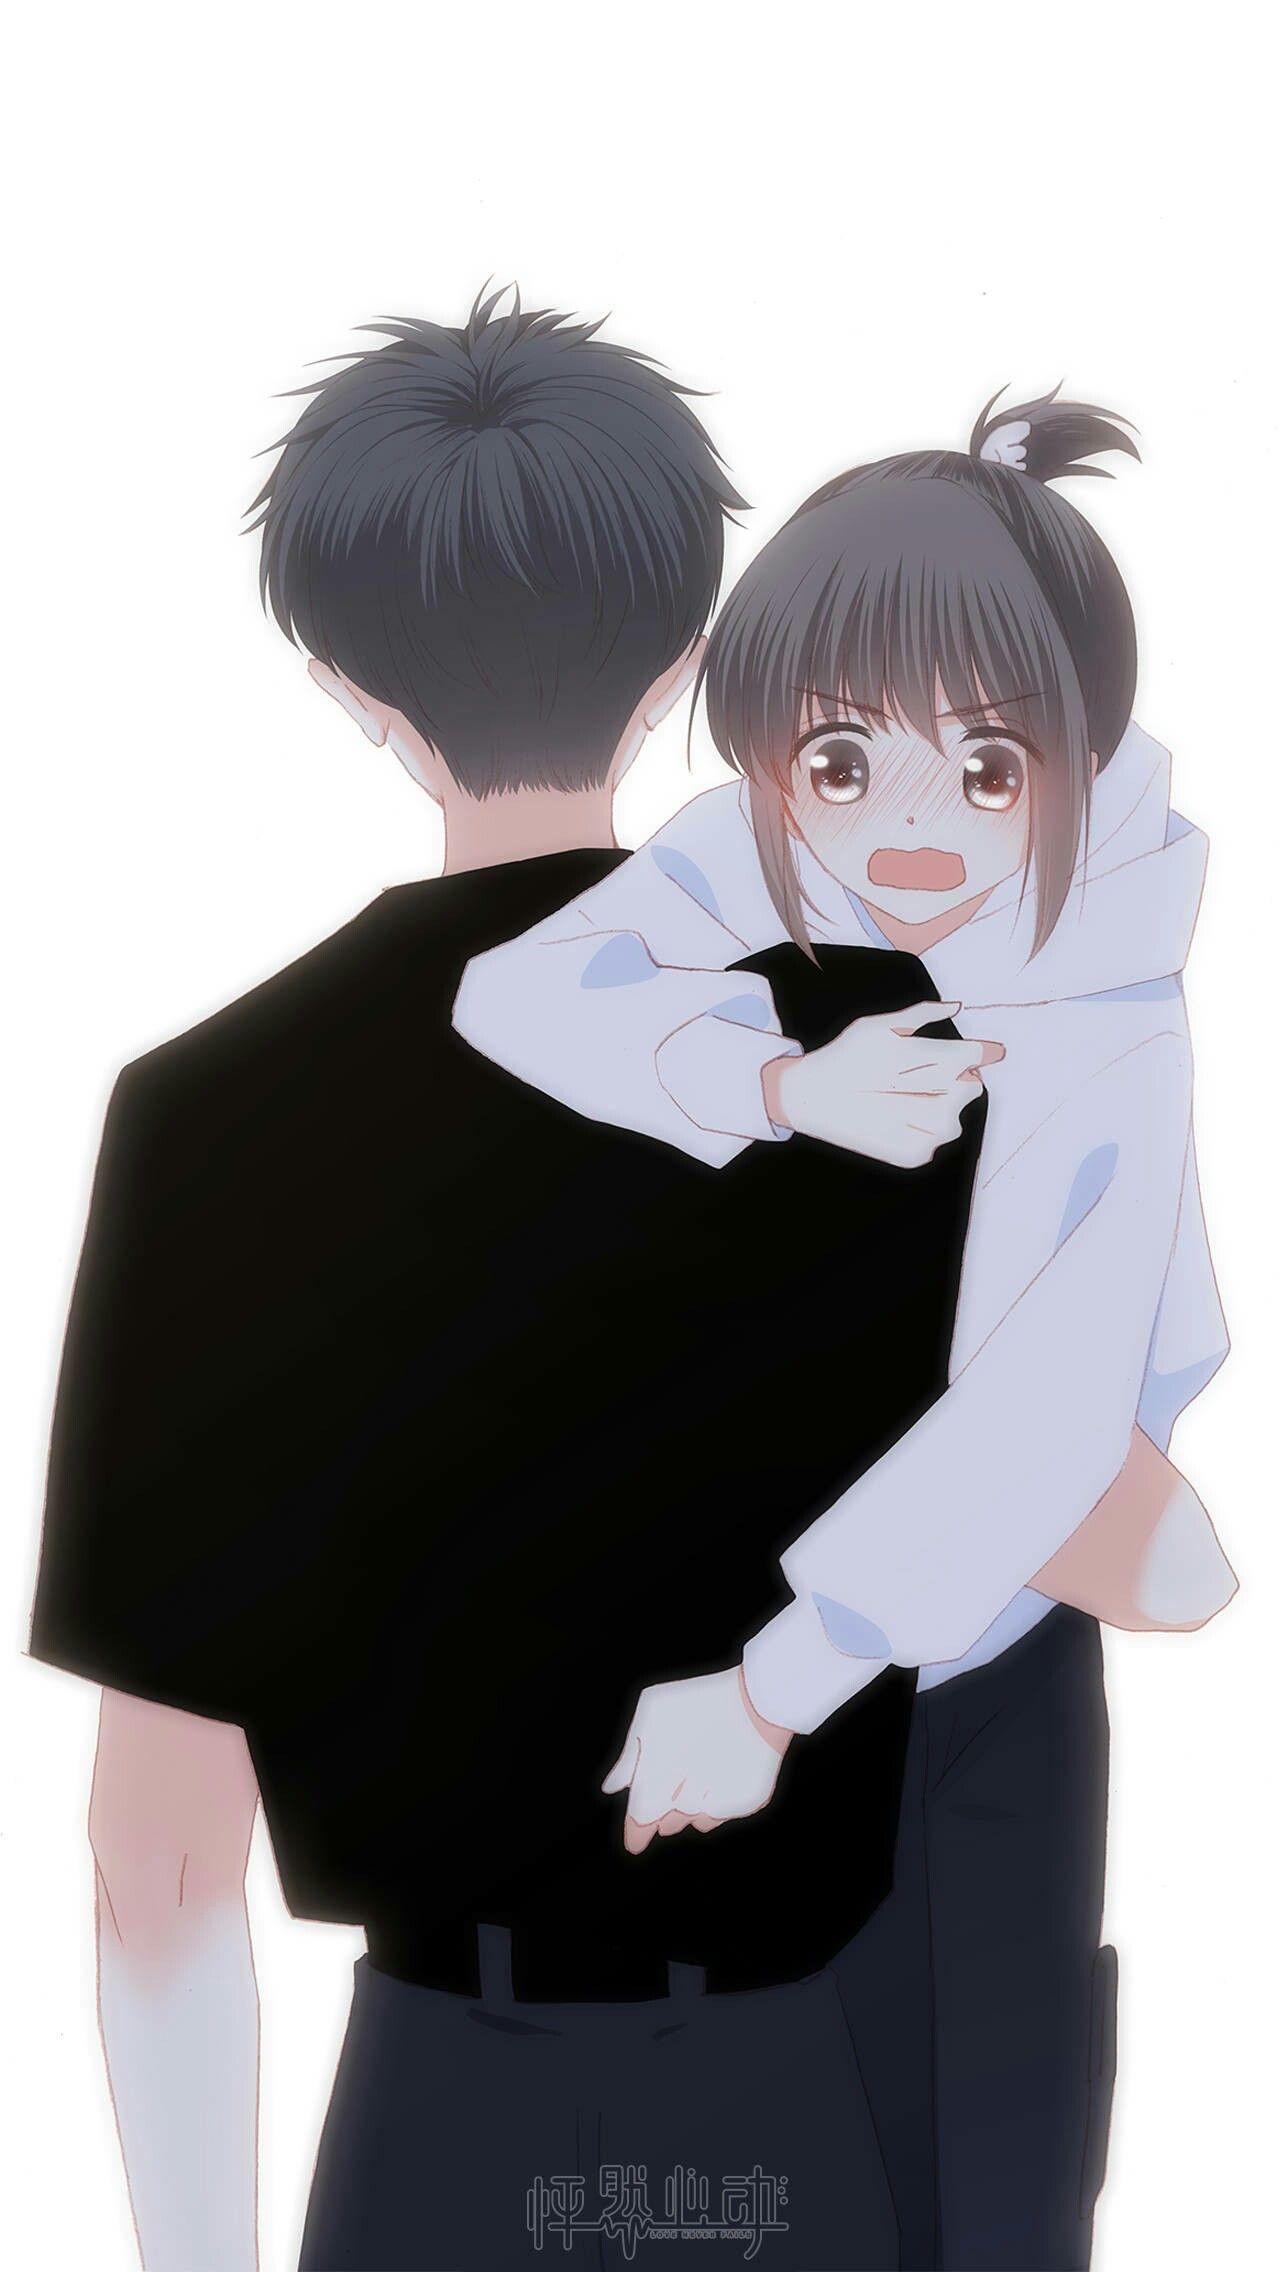 Pin Oleh Mst 17 Di Couples Animasi Studio Animasi Pasangan Anime Lucu